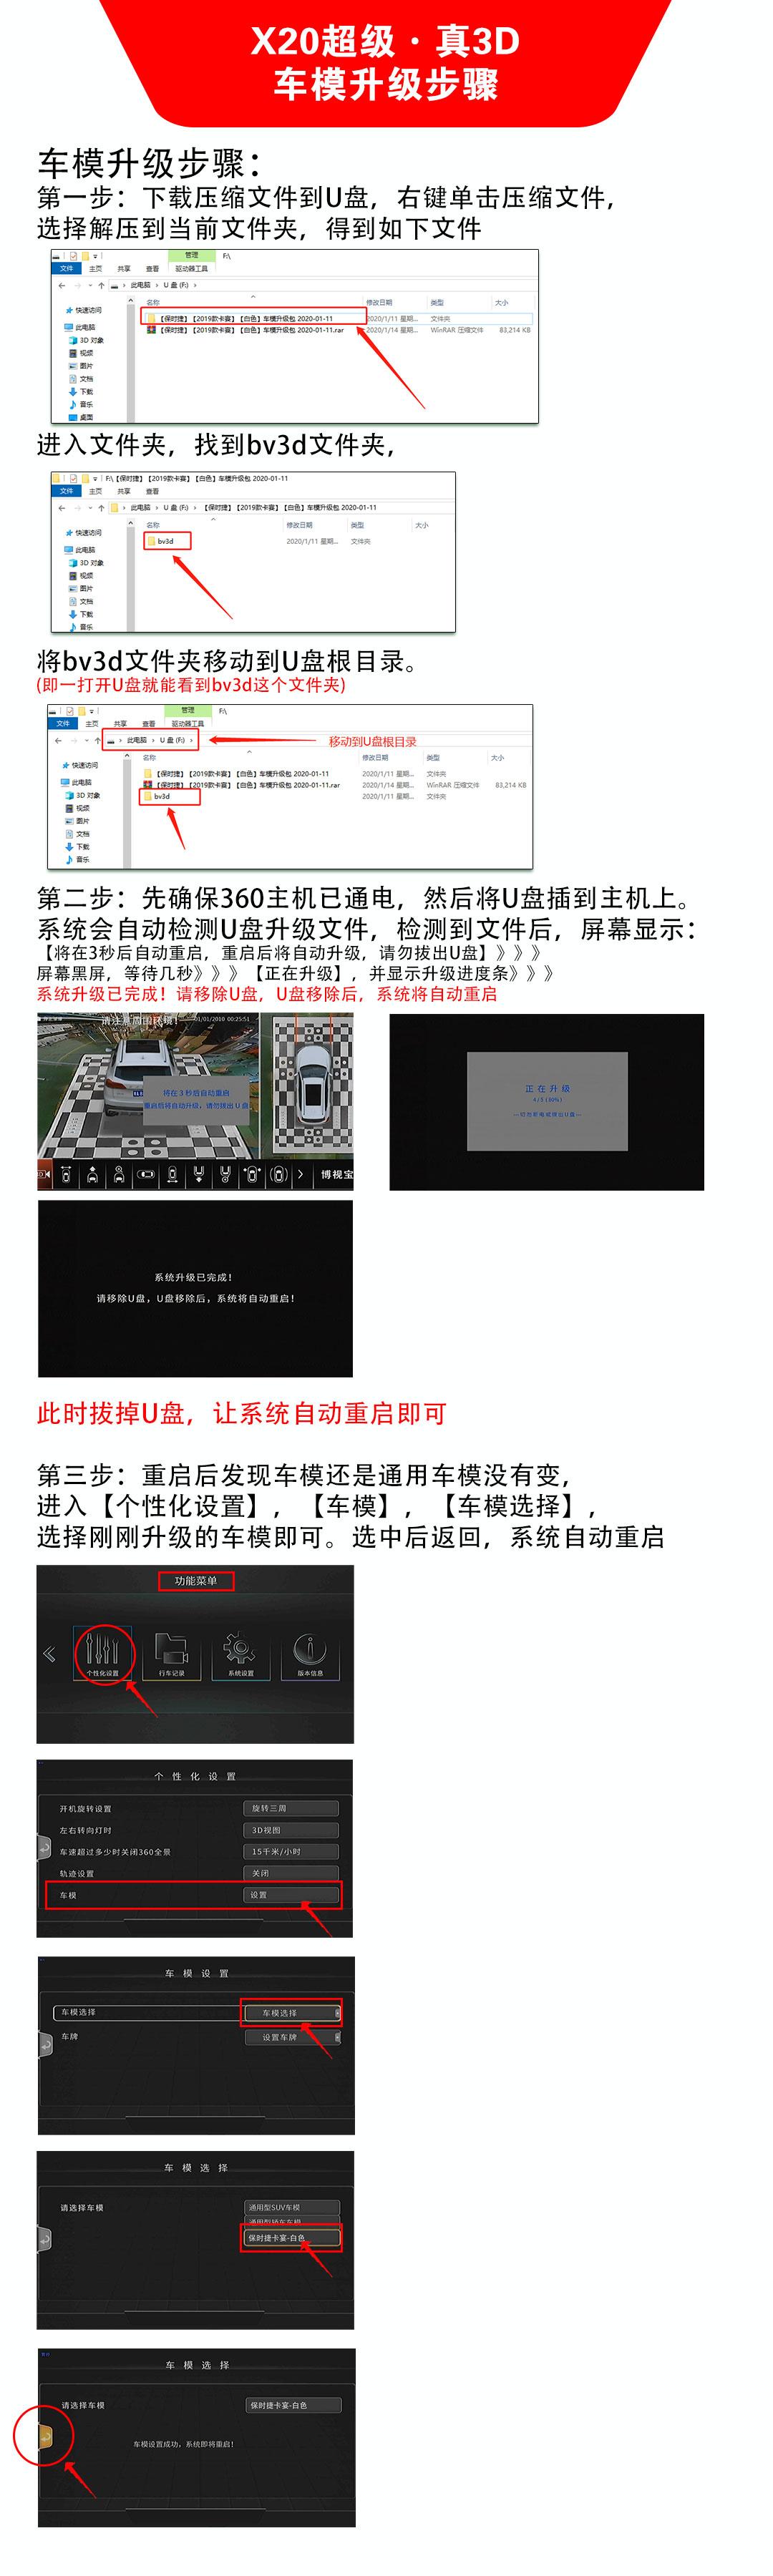 X20車模升級說明.png